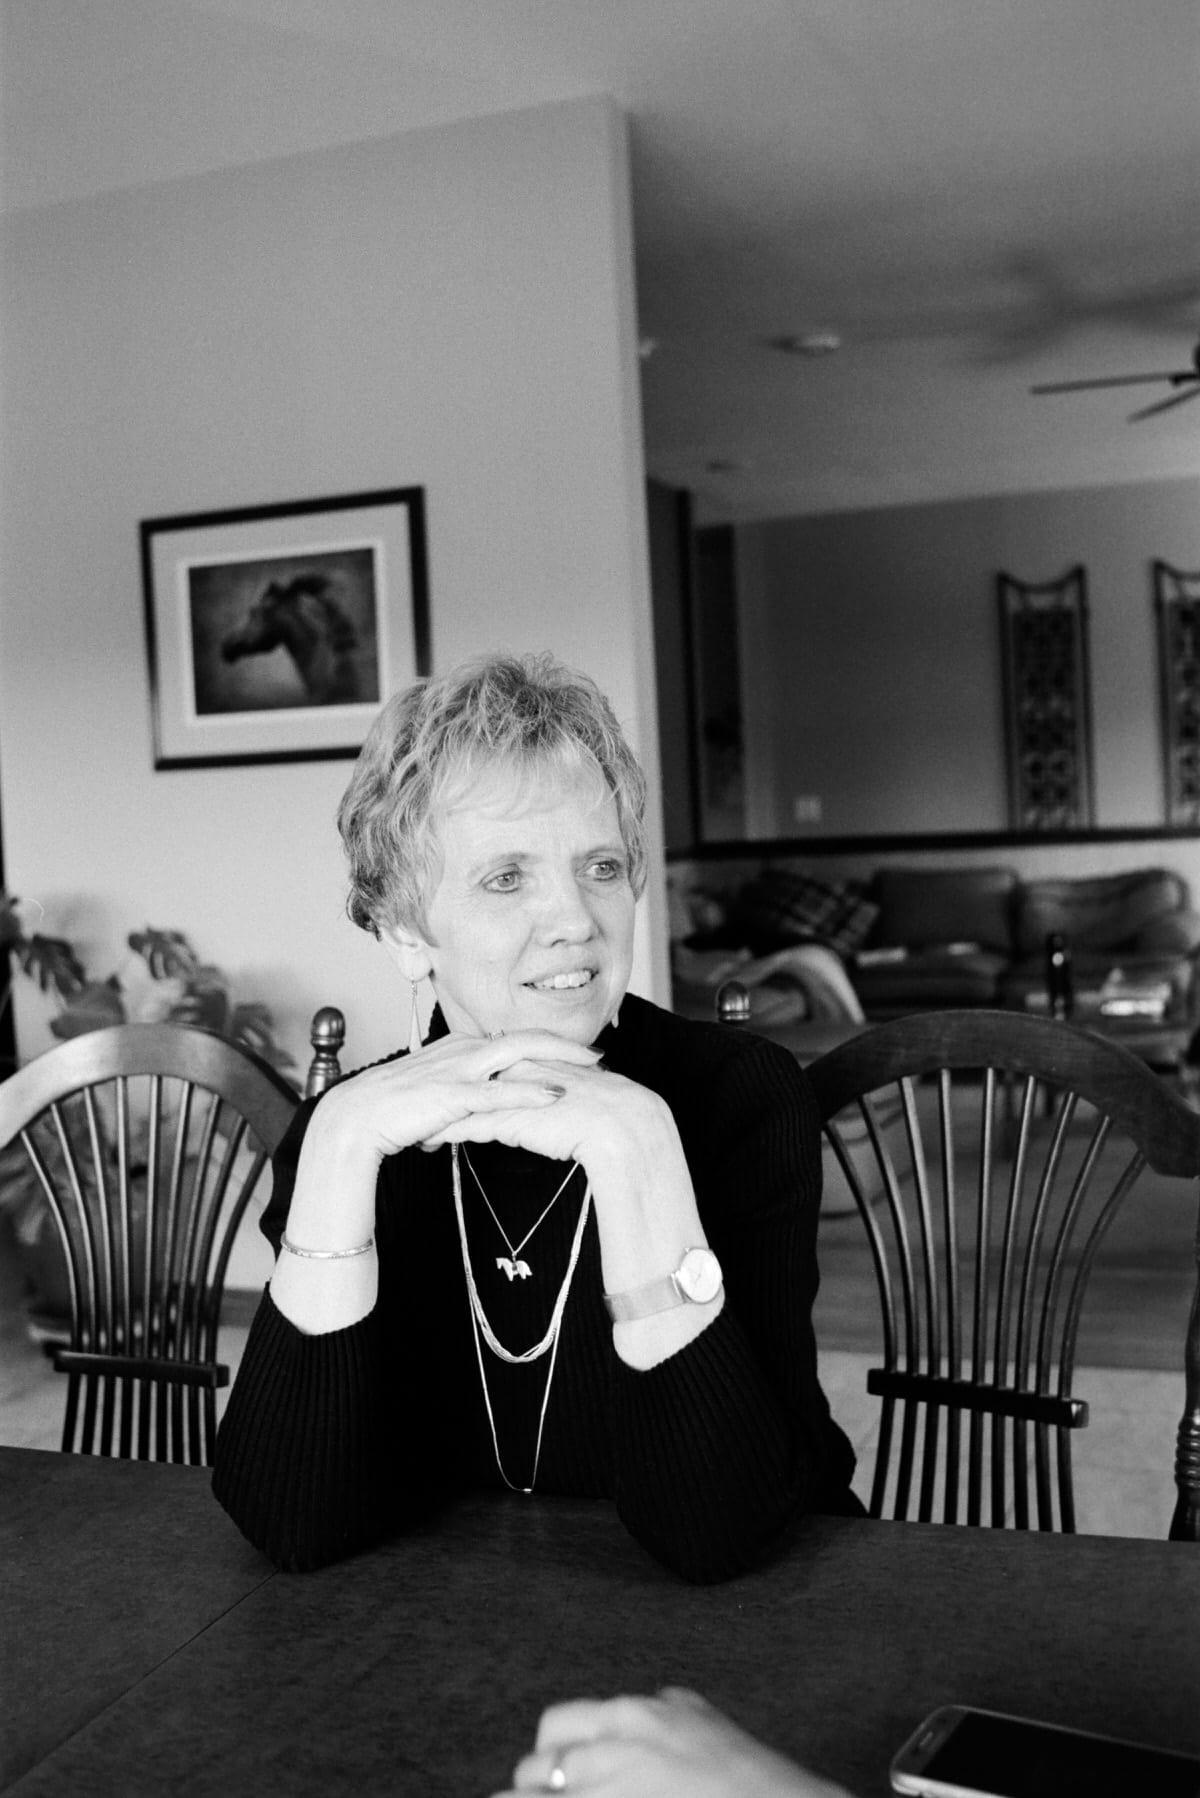 Illuminating-Women-art-exhibition-black-and-white-fine-art-film-photography-by-Studio-L-photographer-Laura-Schneider-10016 2